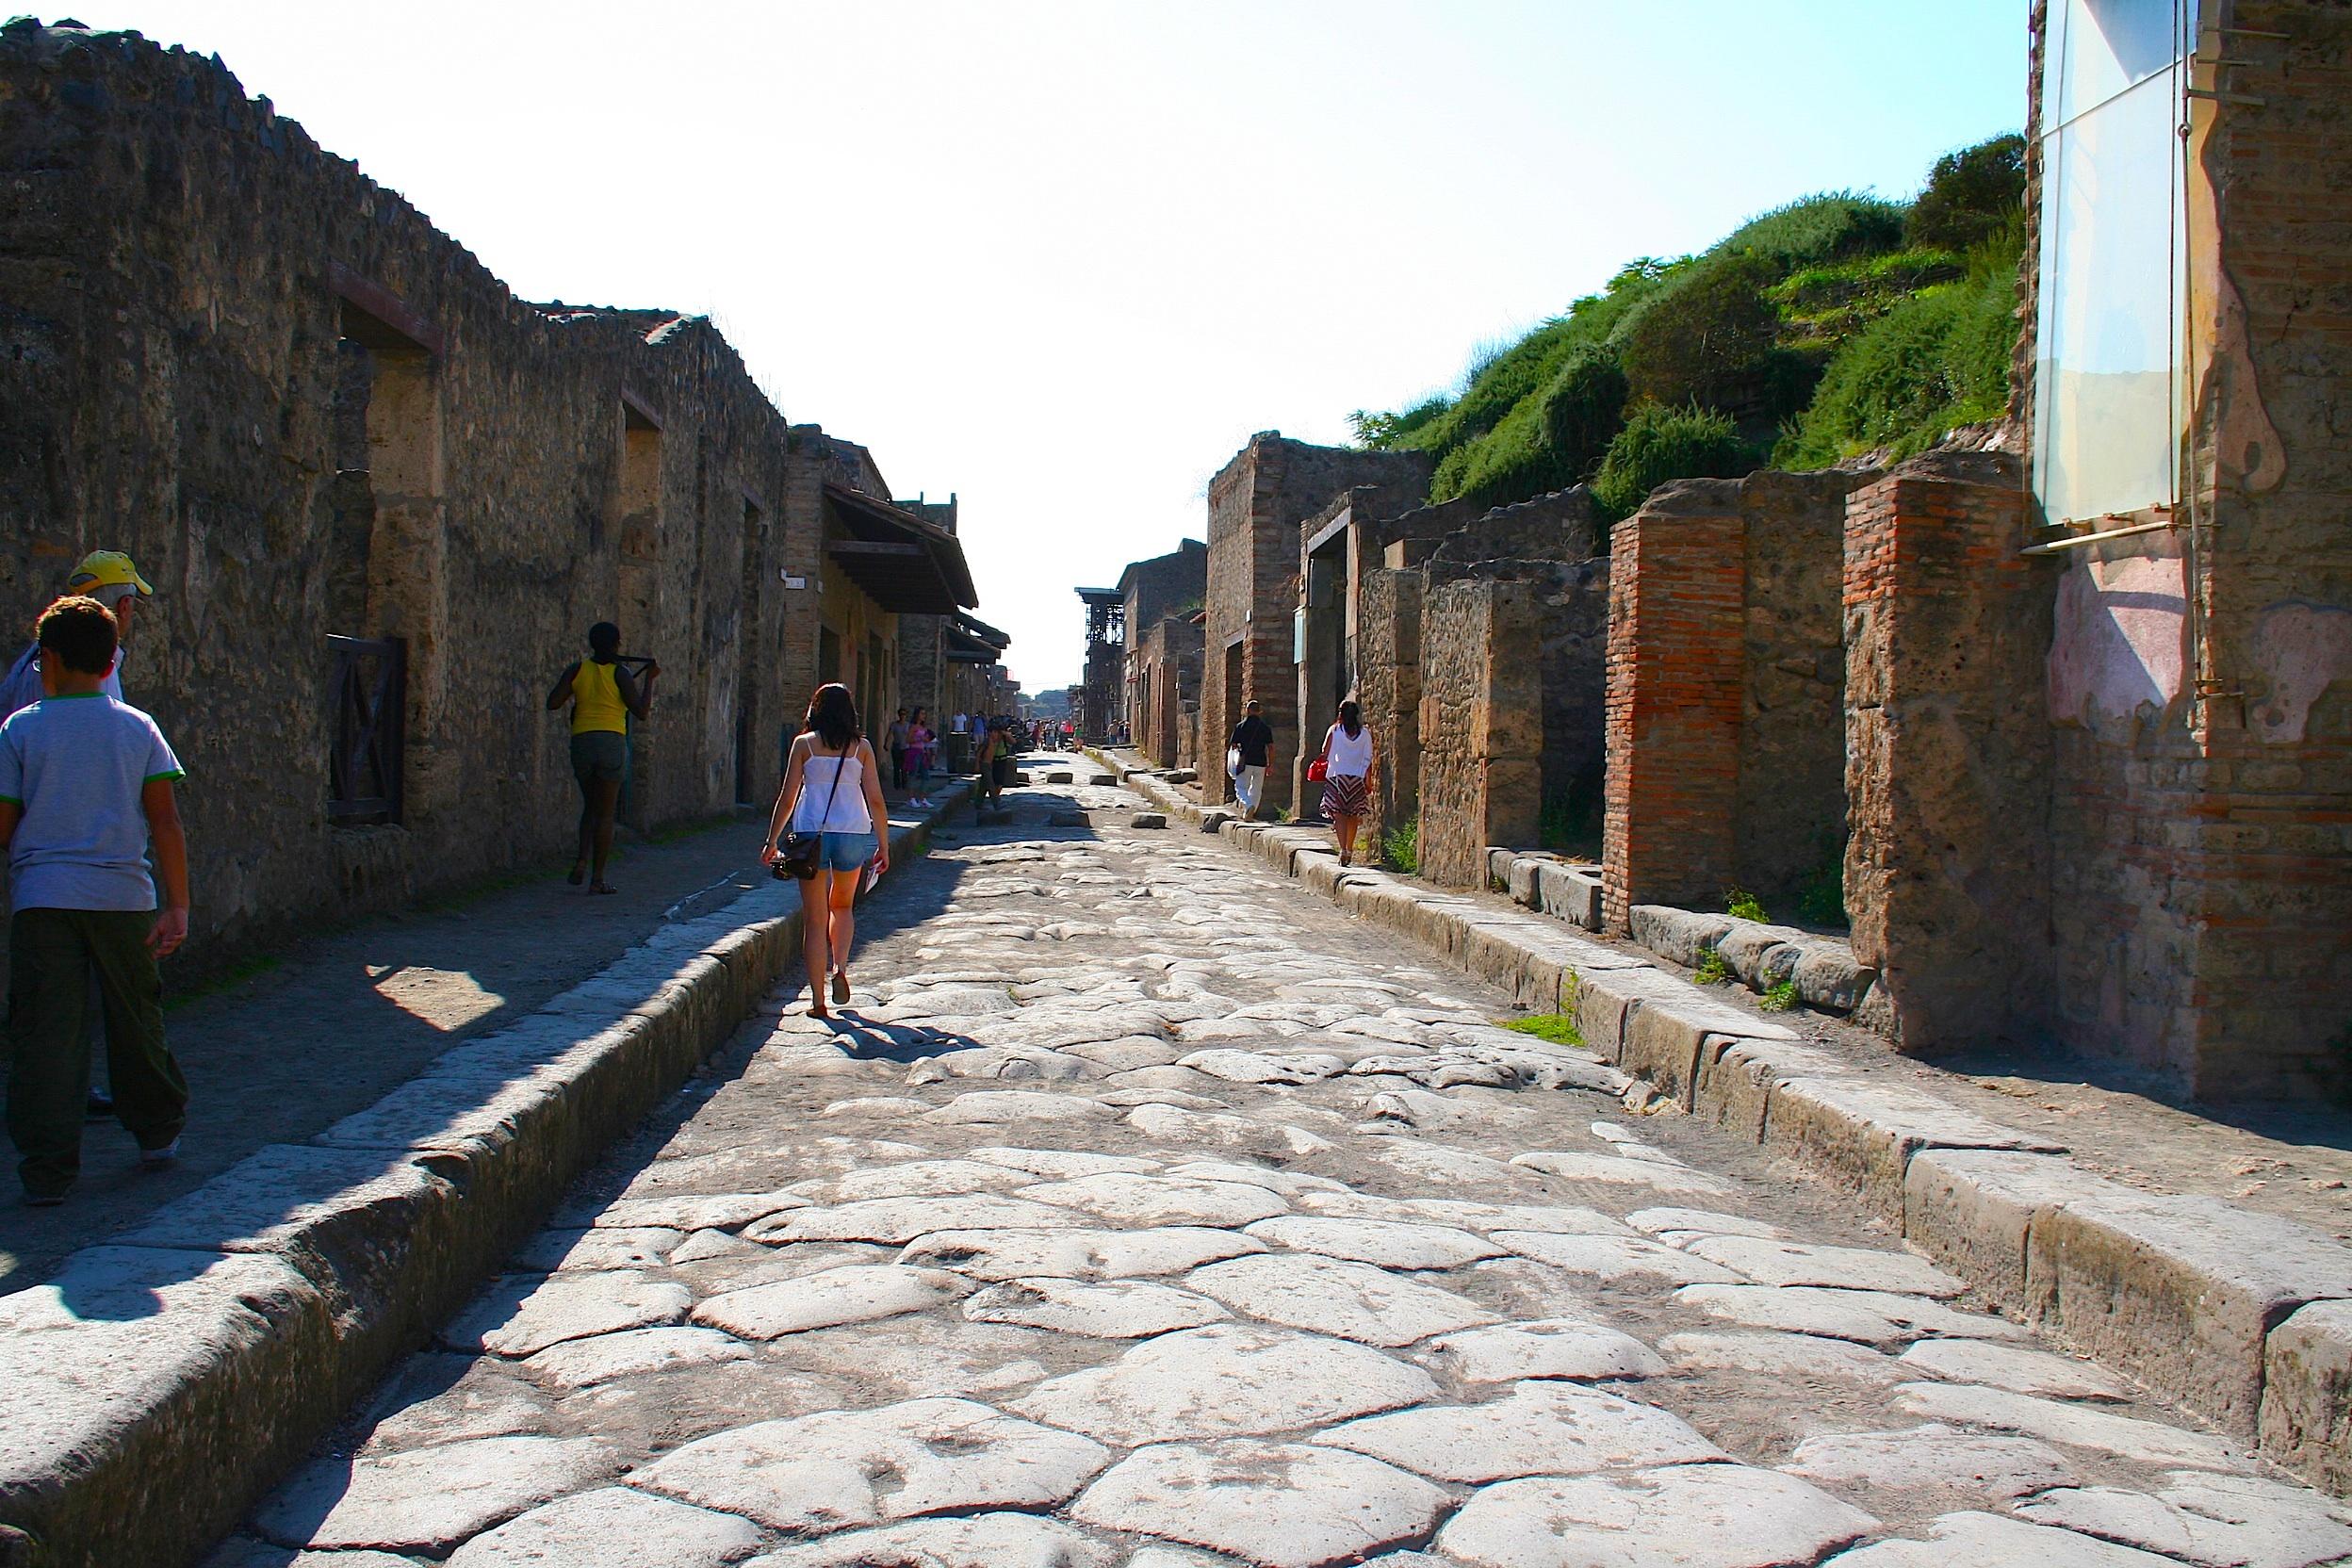 A view down the main street of Via Abondanza in Pompeii